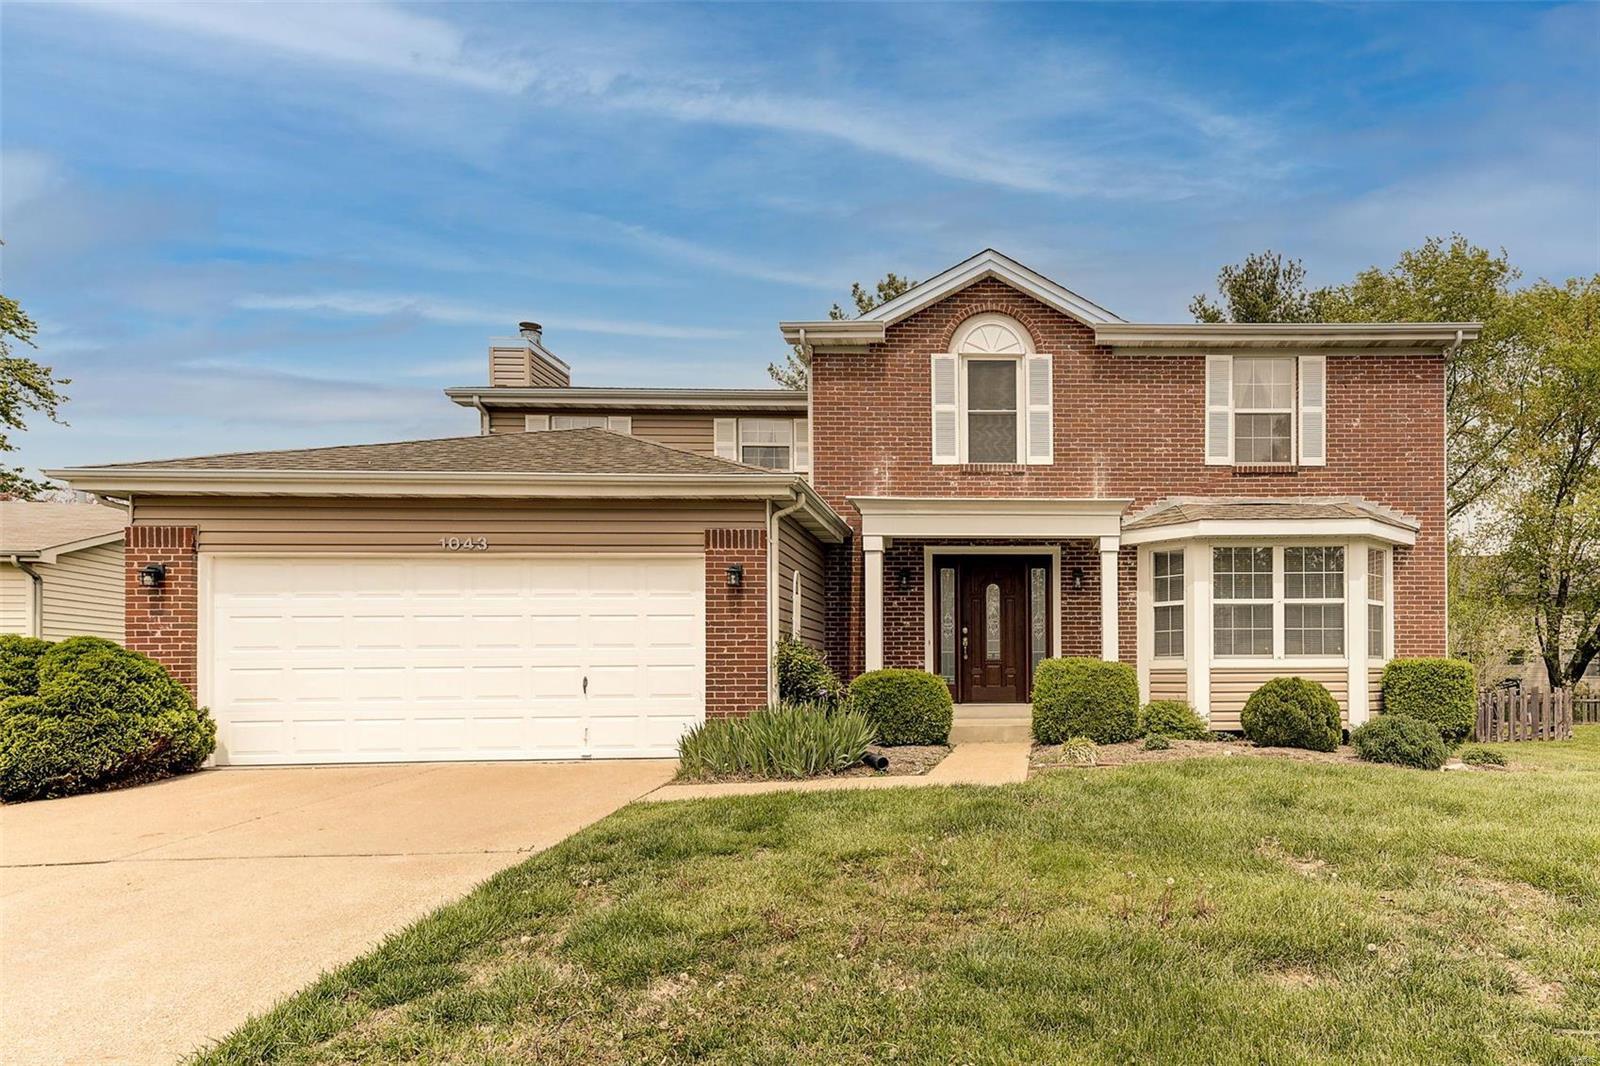 1043 Trifecta Drive Property Photo - Florissant, MO real estate listing